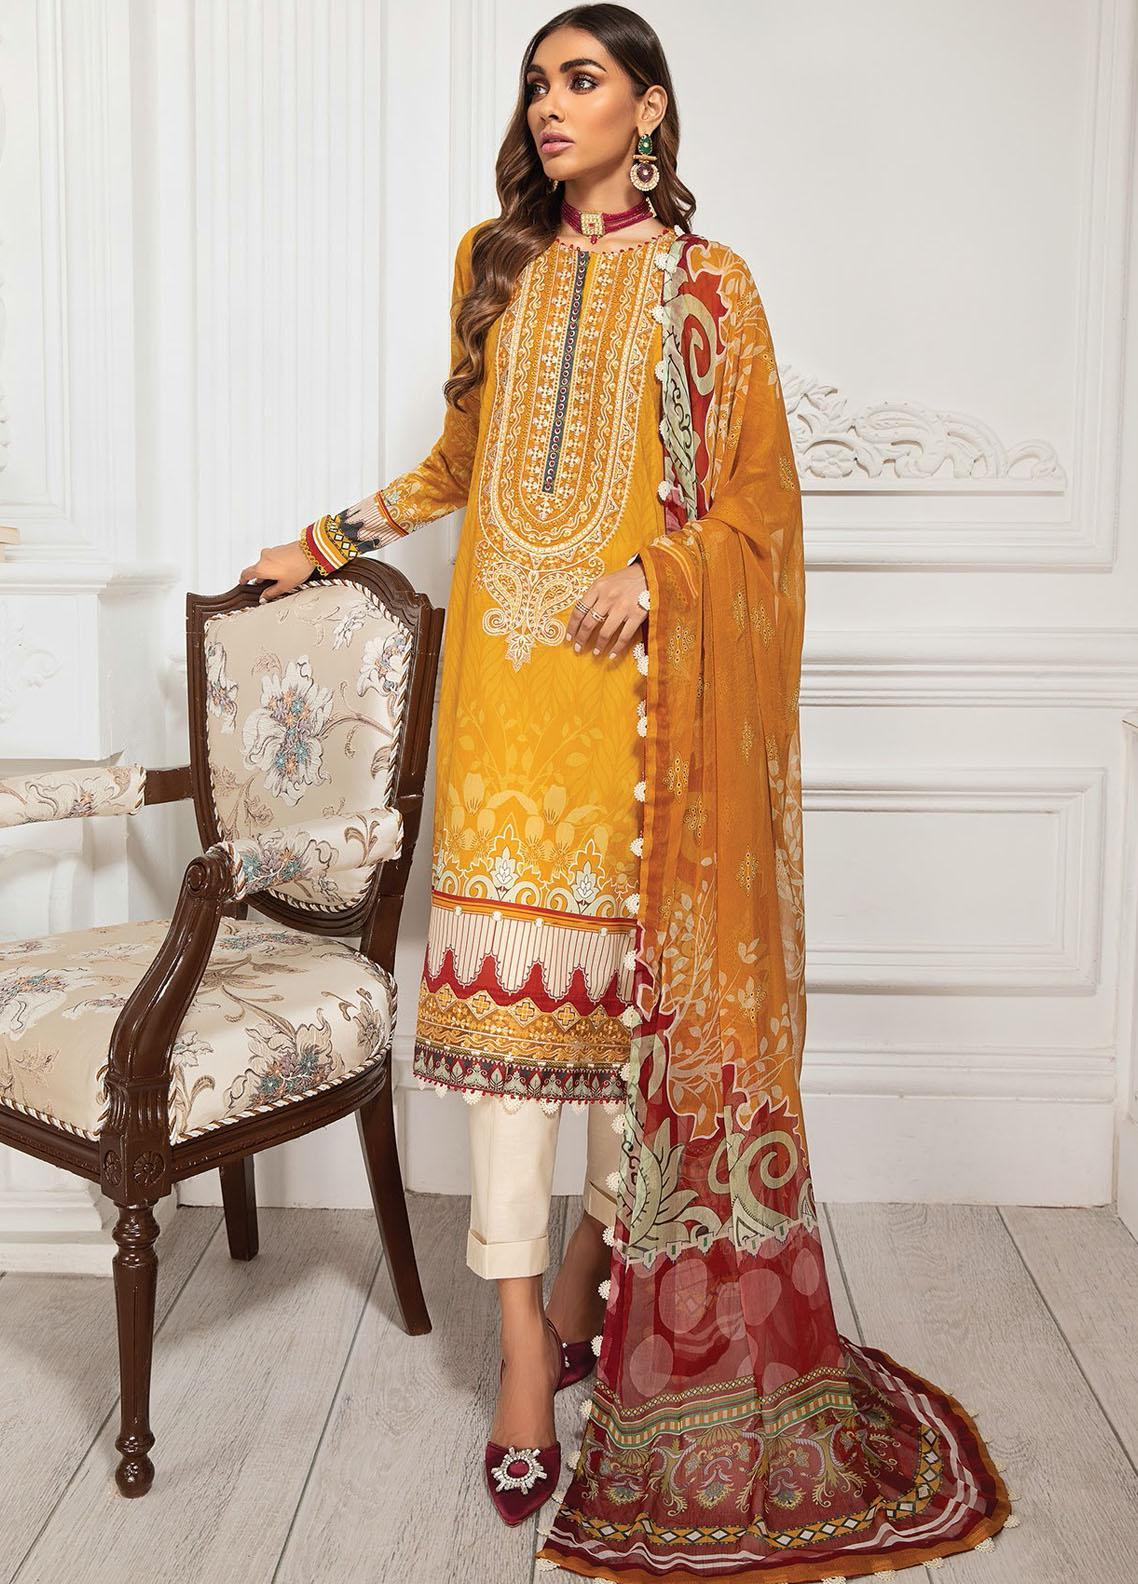 Farasha Embroidered Lawn Suits Unstitched 3 Piece FSH21-L3 08 Marigold - Festive Collection